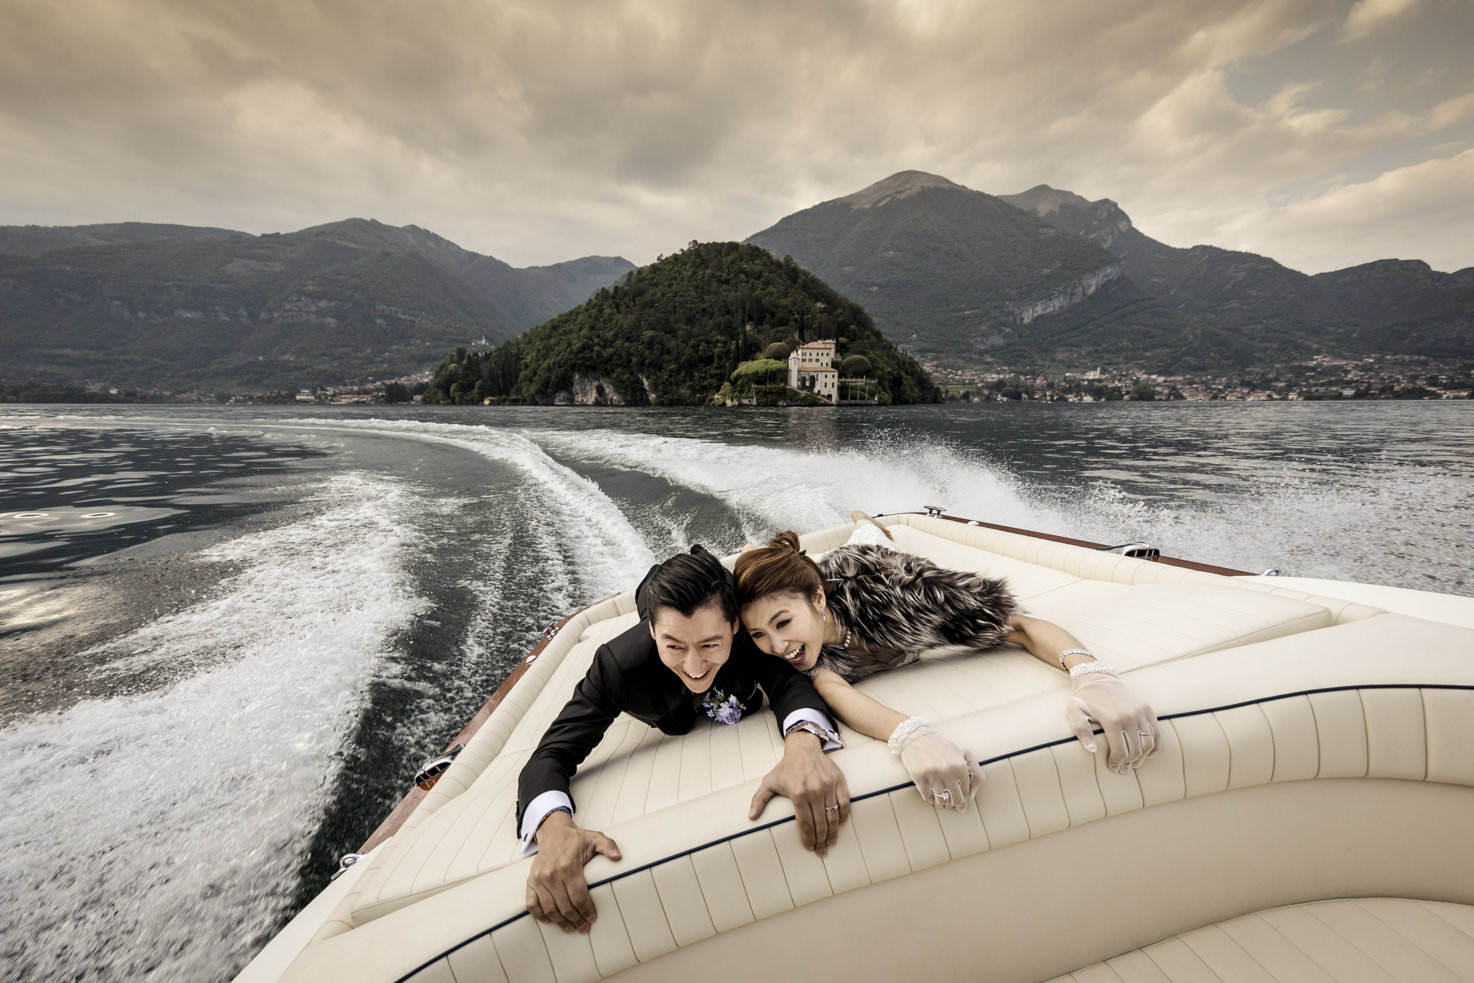 Boat tour on Lake Como